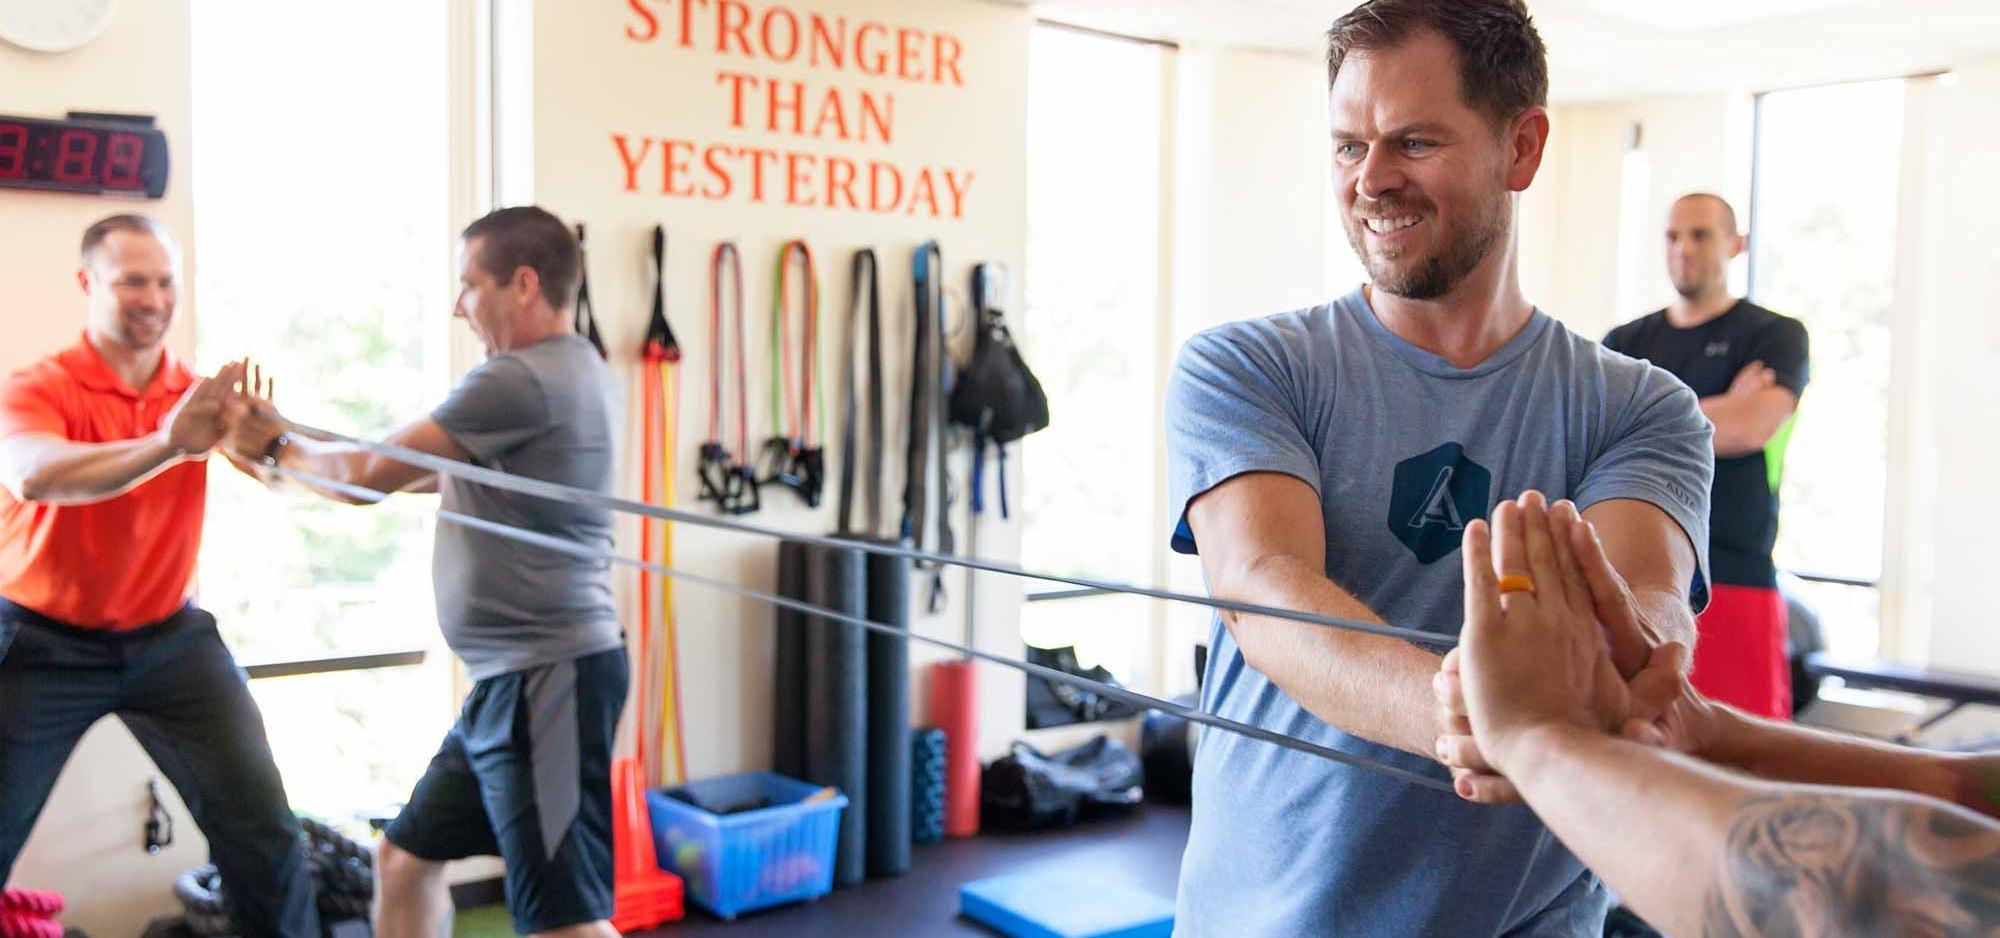 personal-training-transformation-weight-loss.jpg